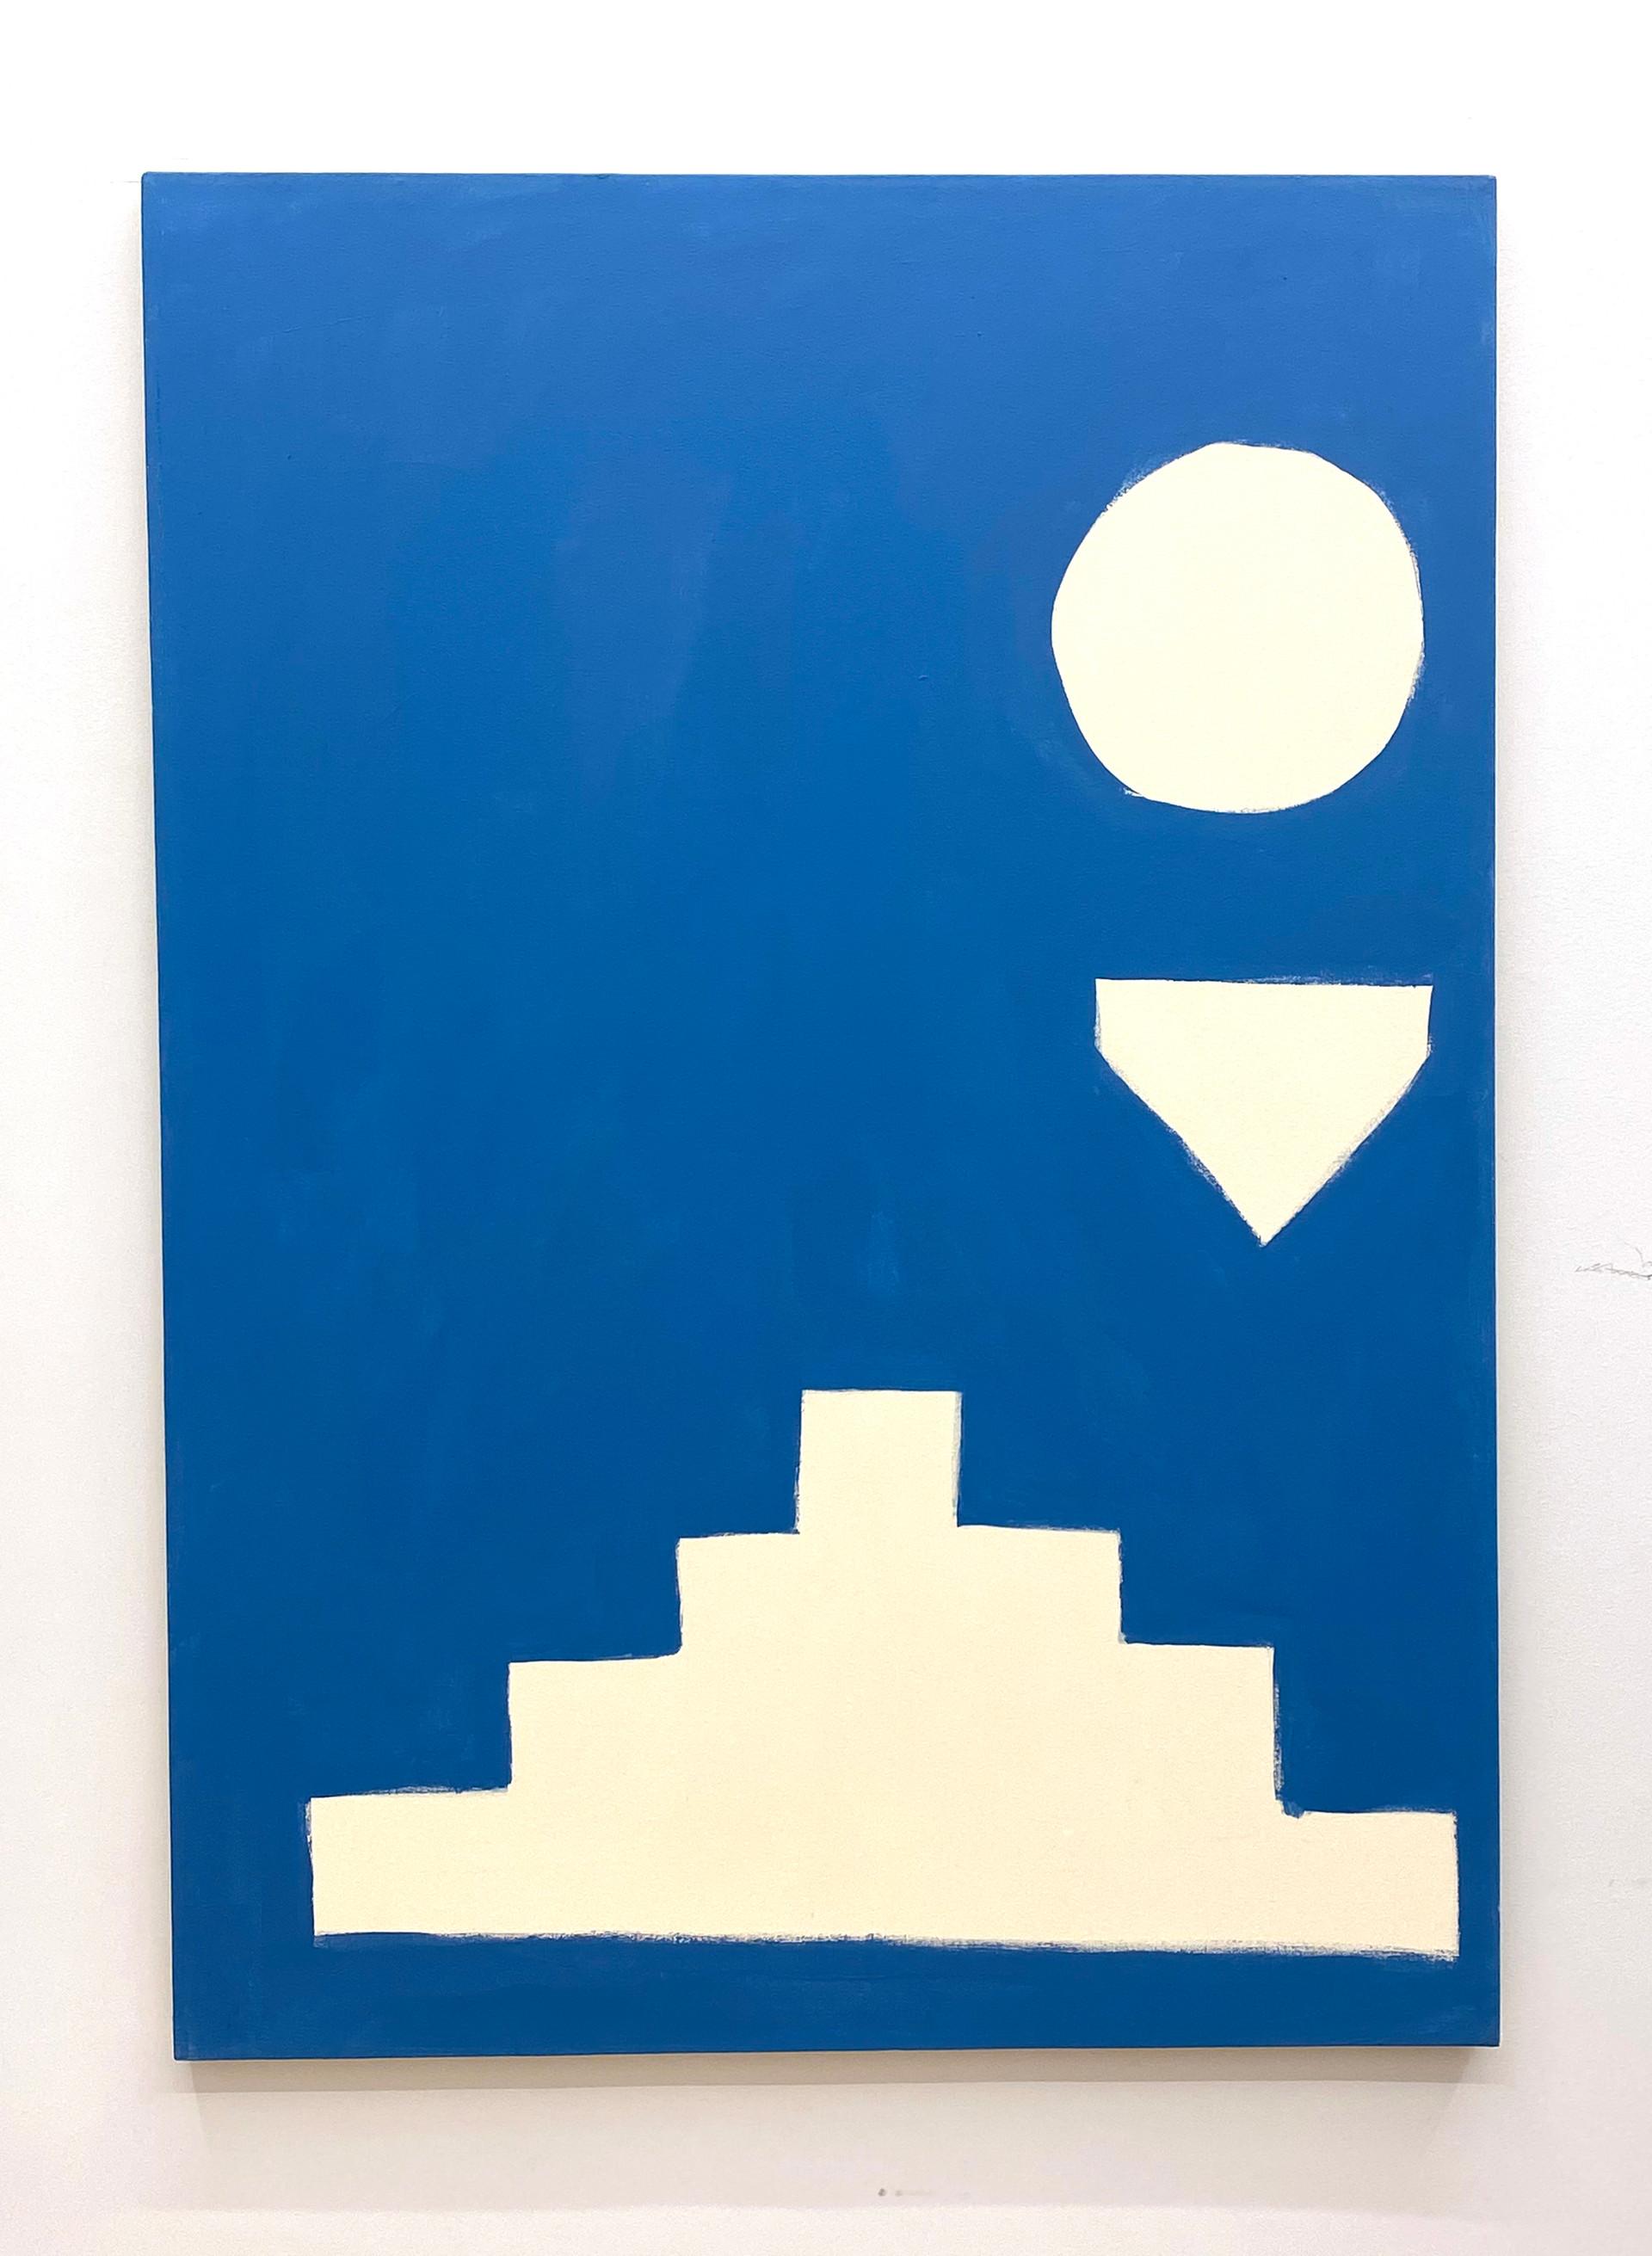 Stephen Felton Untitled, 2019 Acrylic on canvas 55 x 39 inches